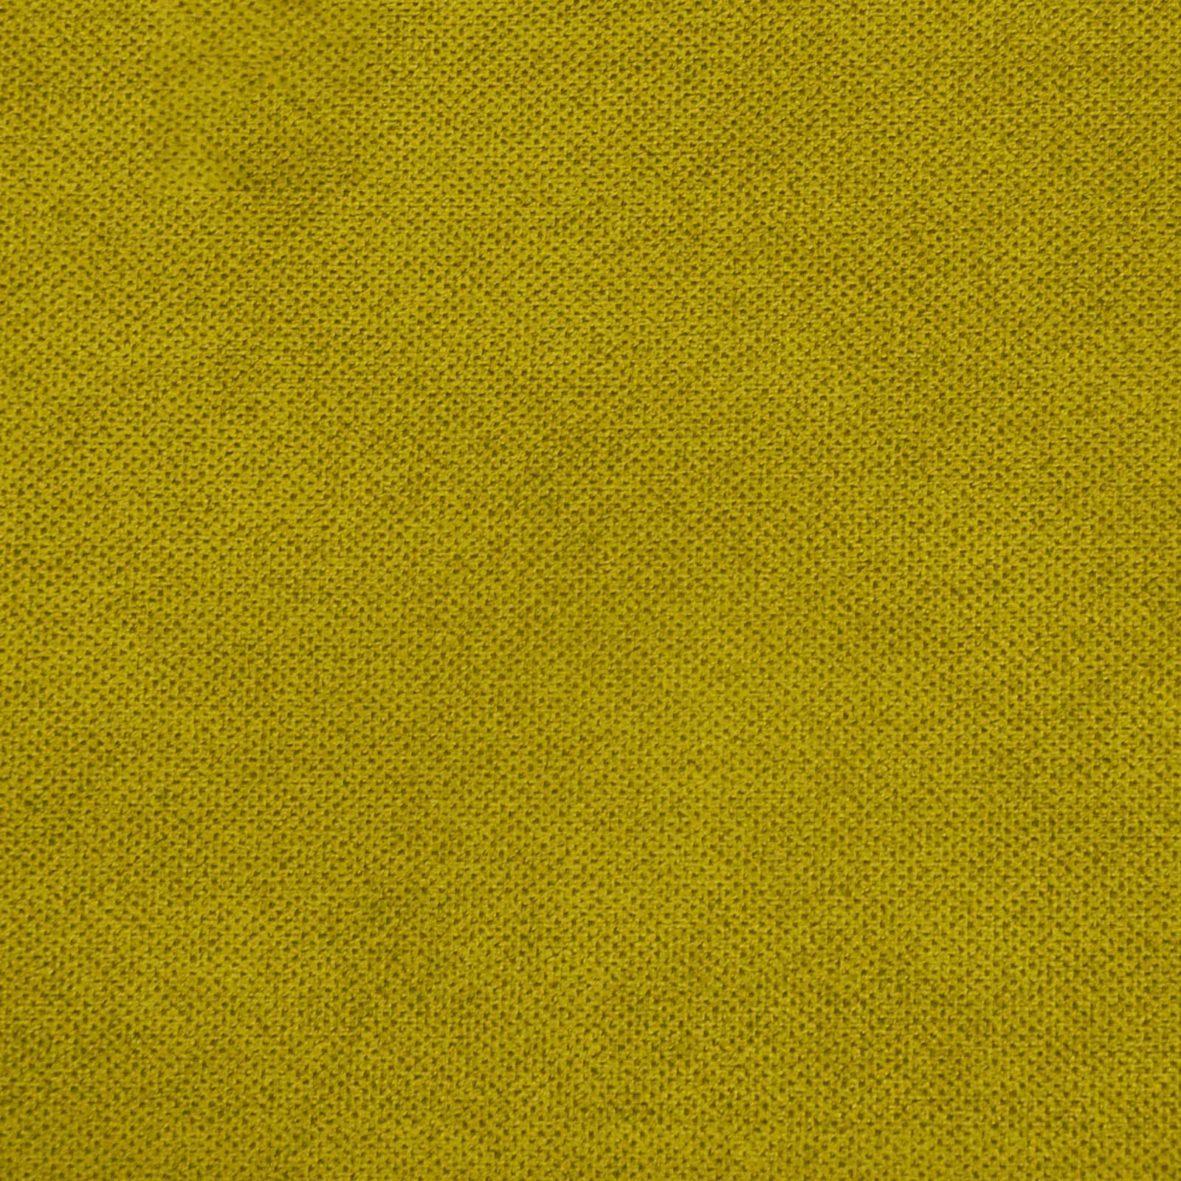 4940-1181x1181